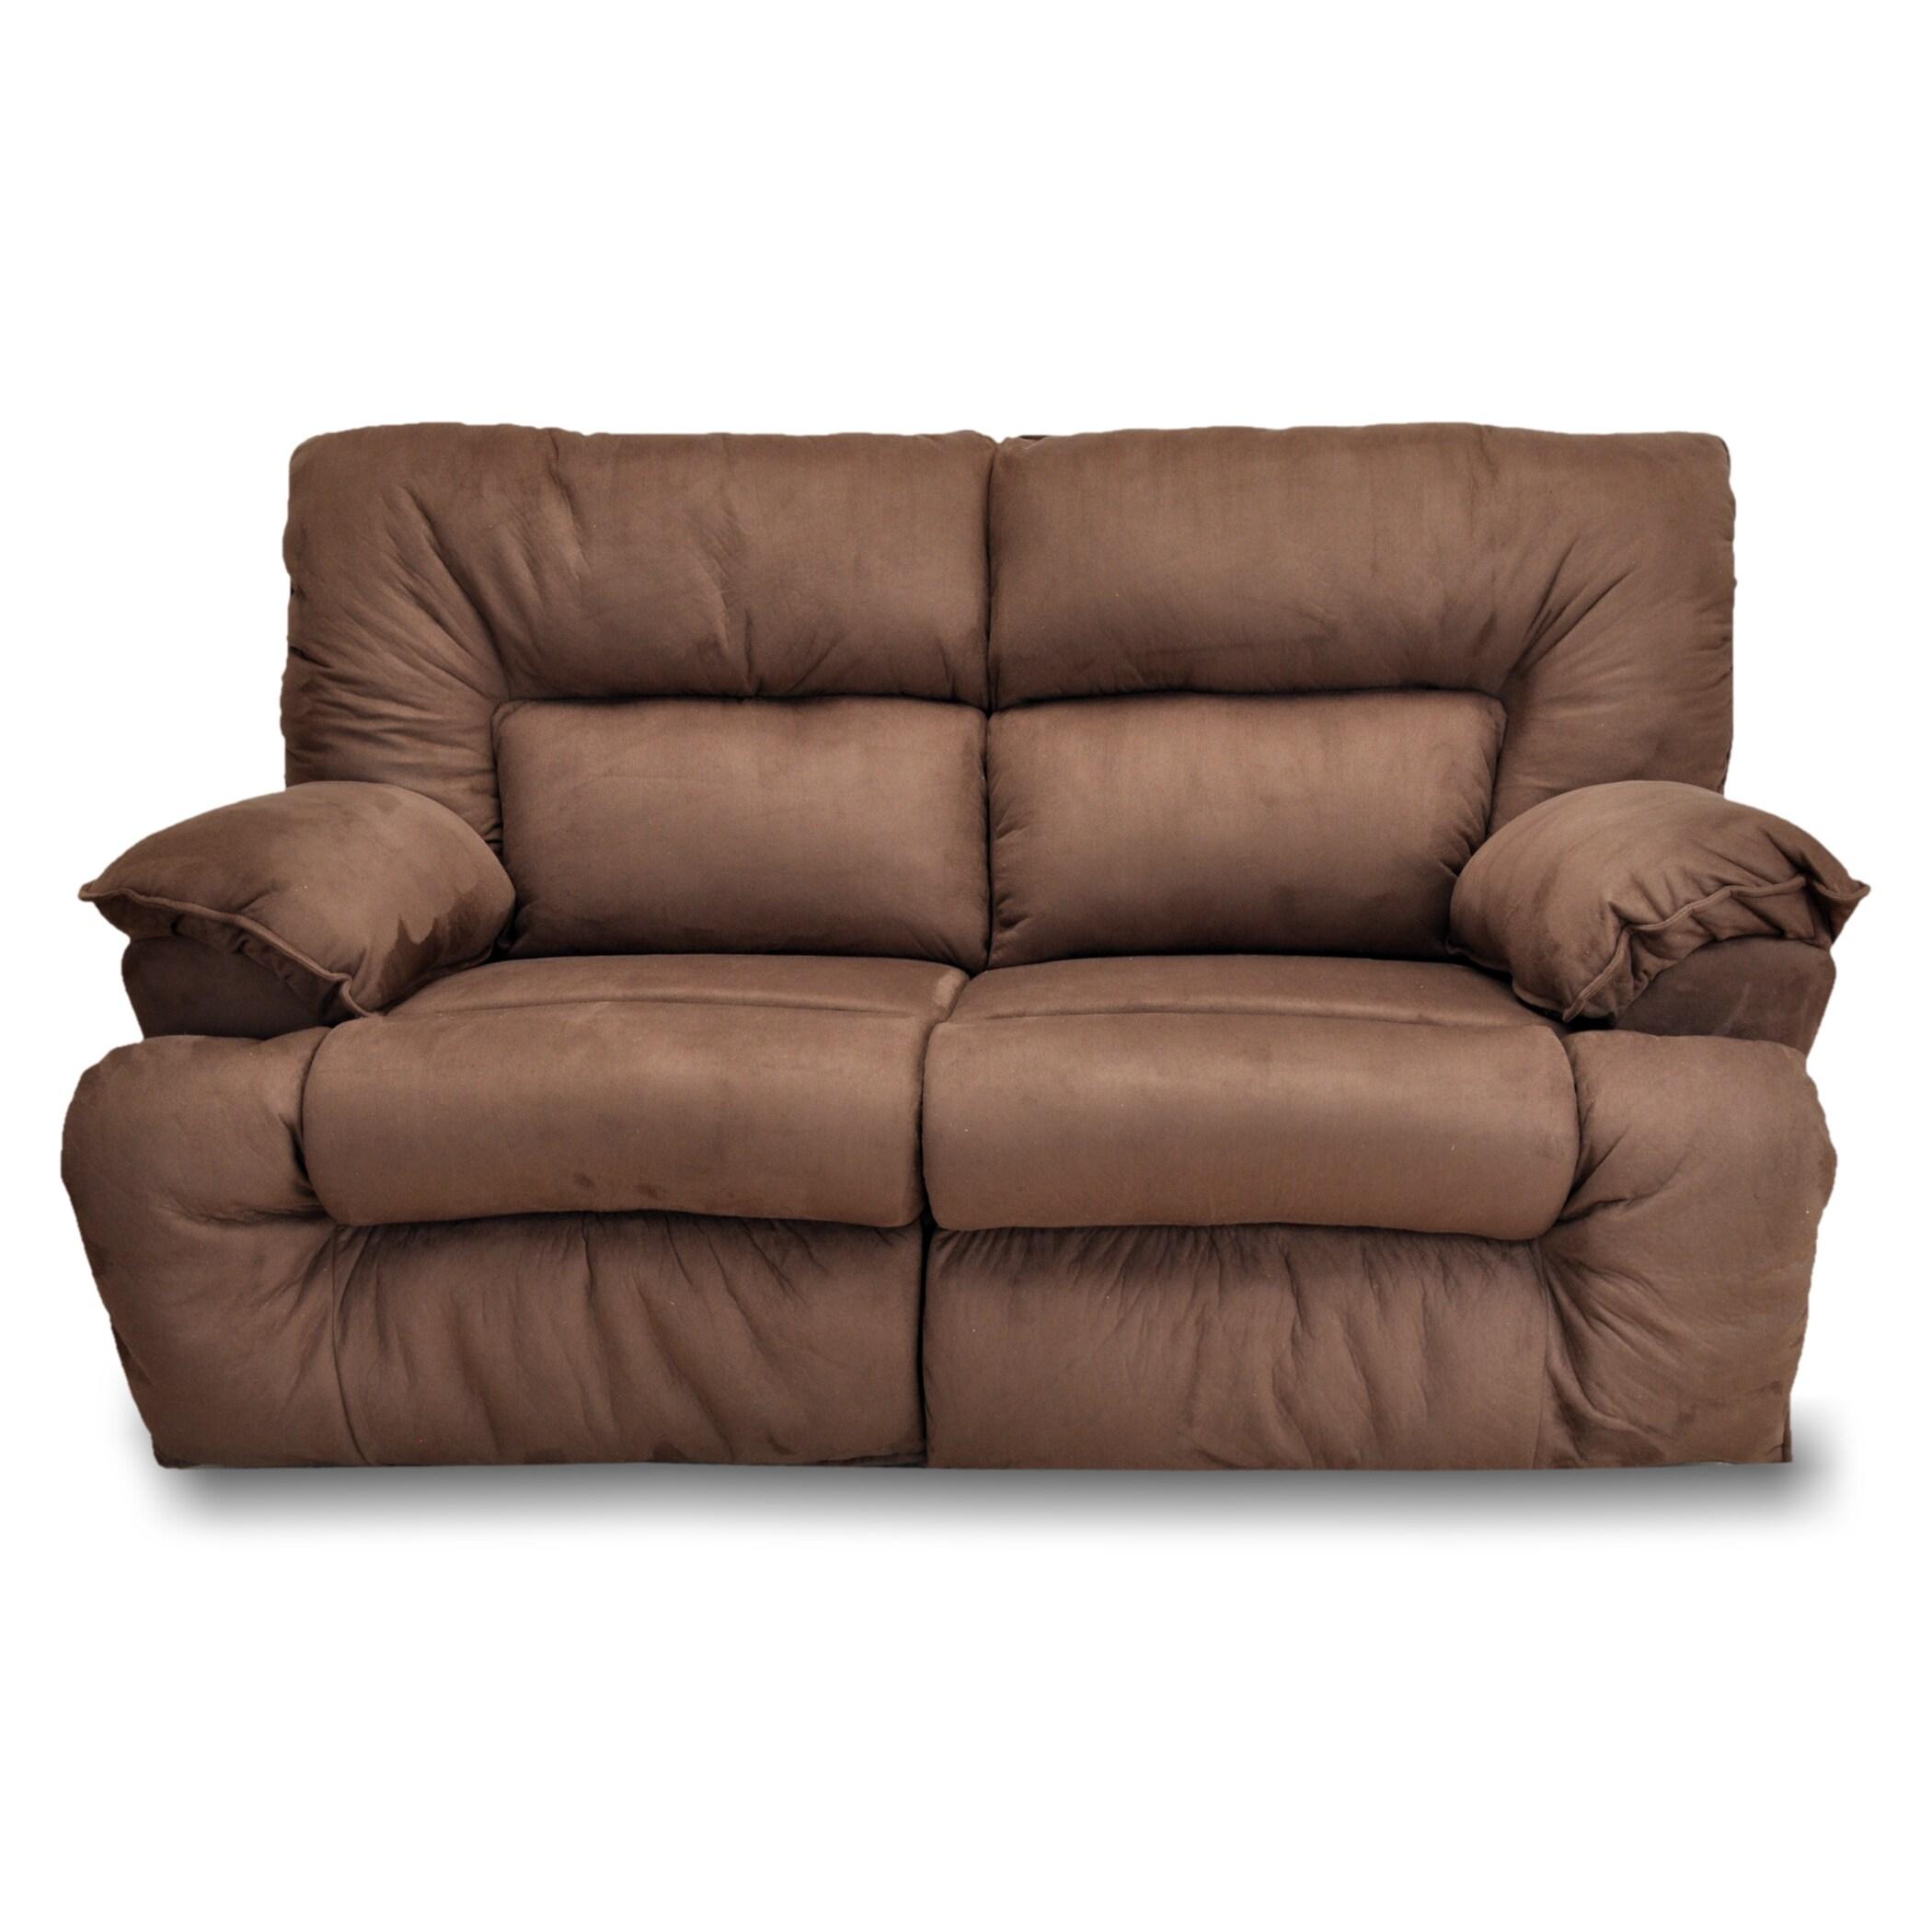 Pleasing Franklin Tristin Mink Microfiber Dual Reclining Sofa And Loveseat Set Cjindustries Chair Design For Home Cjindustriesco